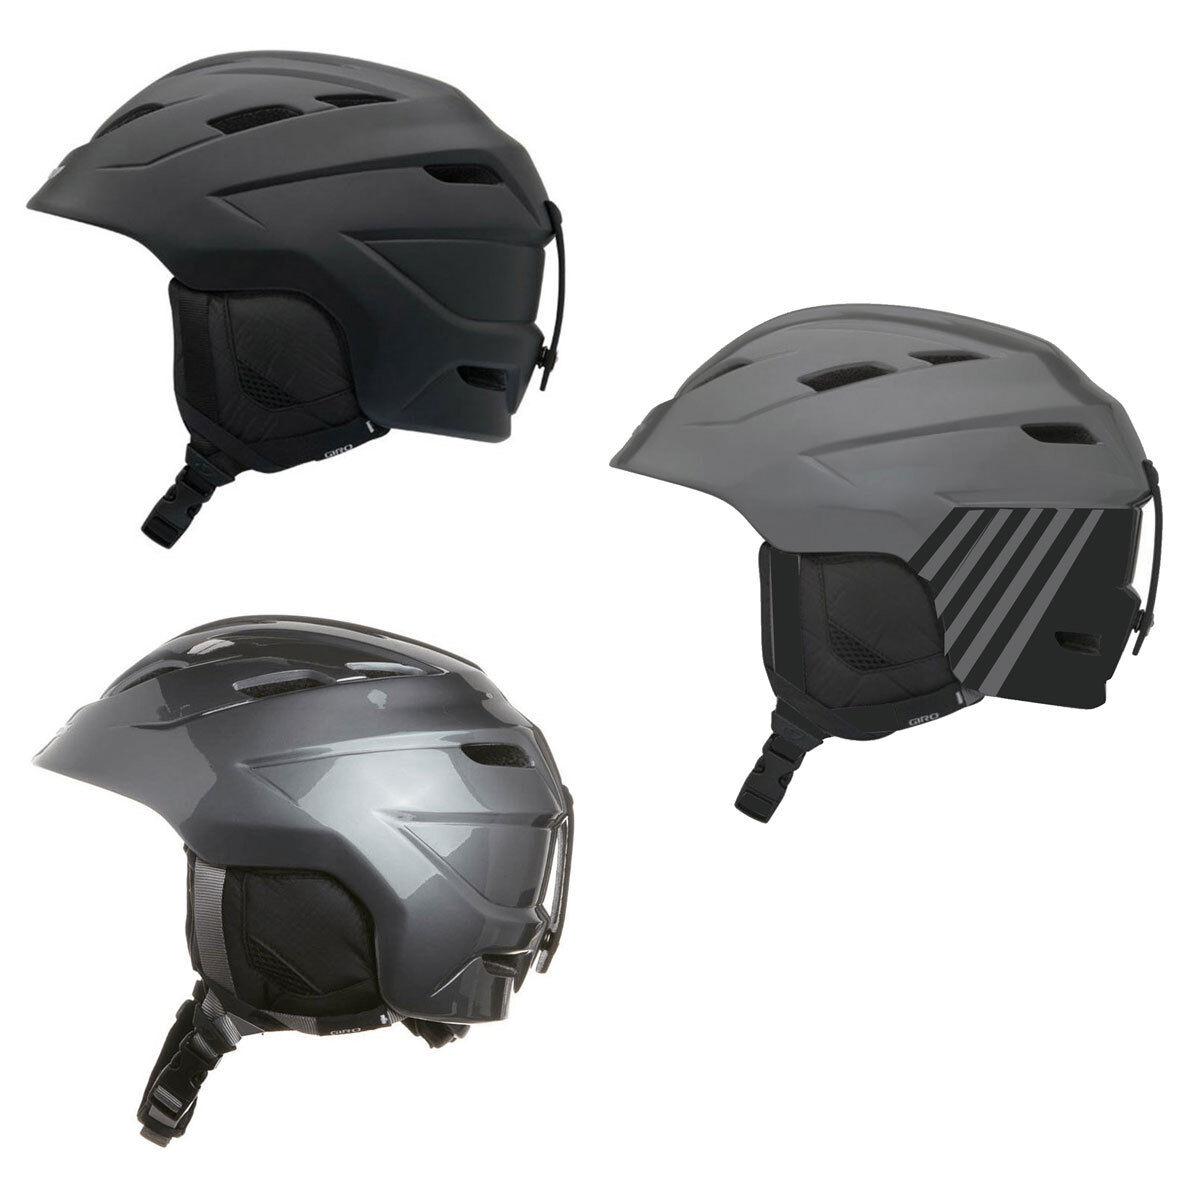 GIRO NINE.10 2018 UNISEX Snowboardhelm Skihelm Ski Snowboard Helm Helmet 240080